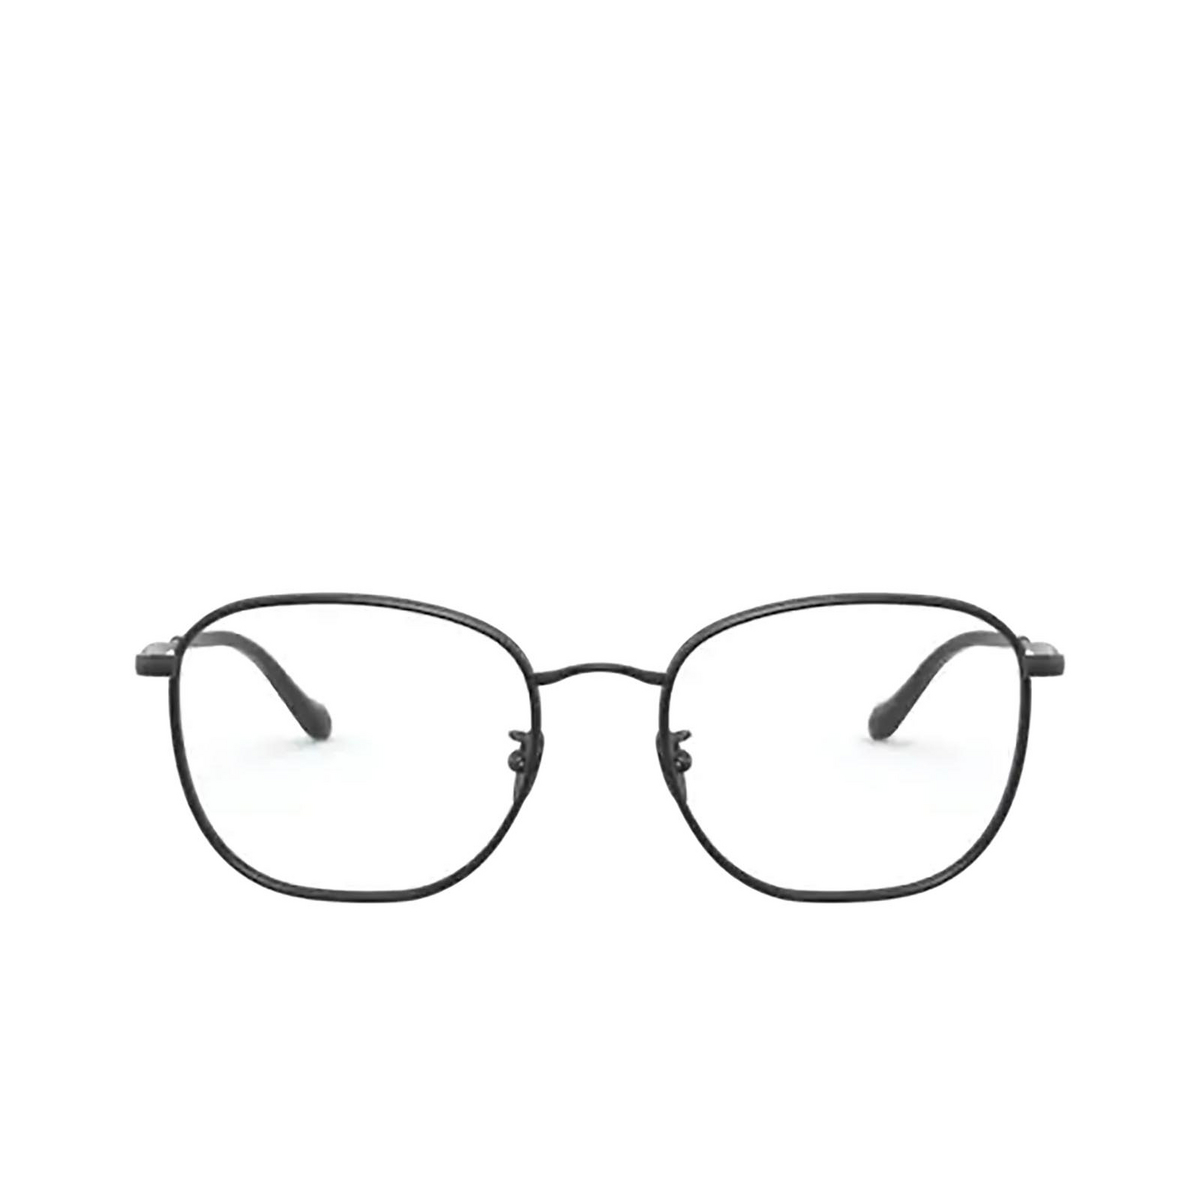 Giorgio Armani® Square Eyeglasses: AR5105J color Black&matte Black 3001 - front view.